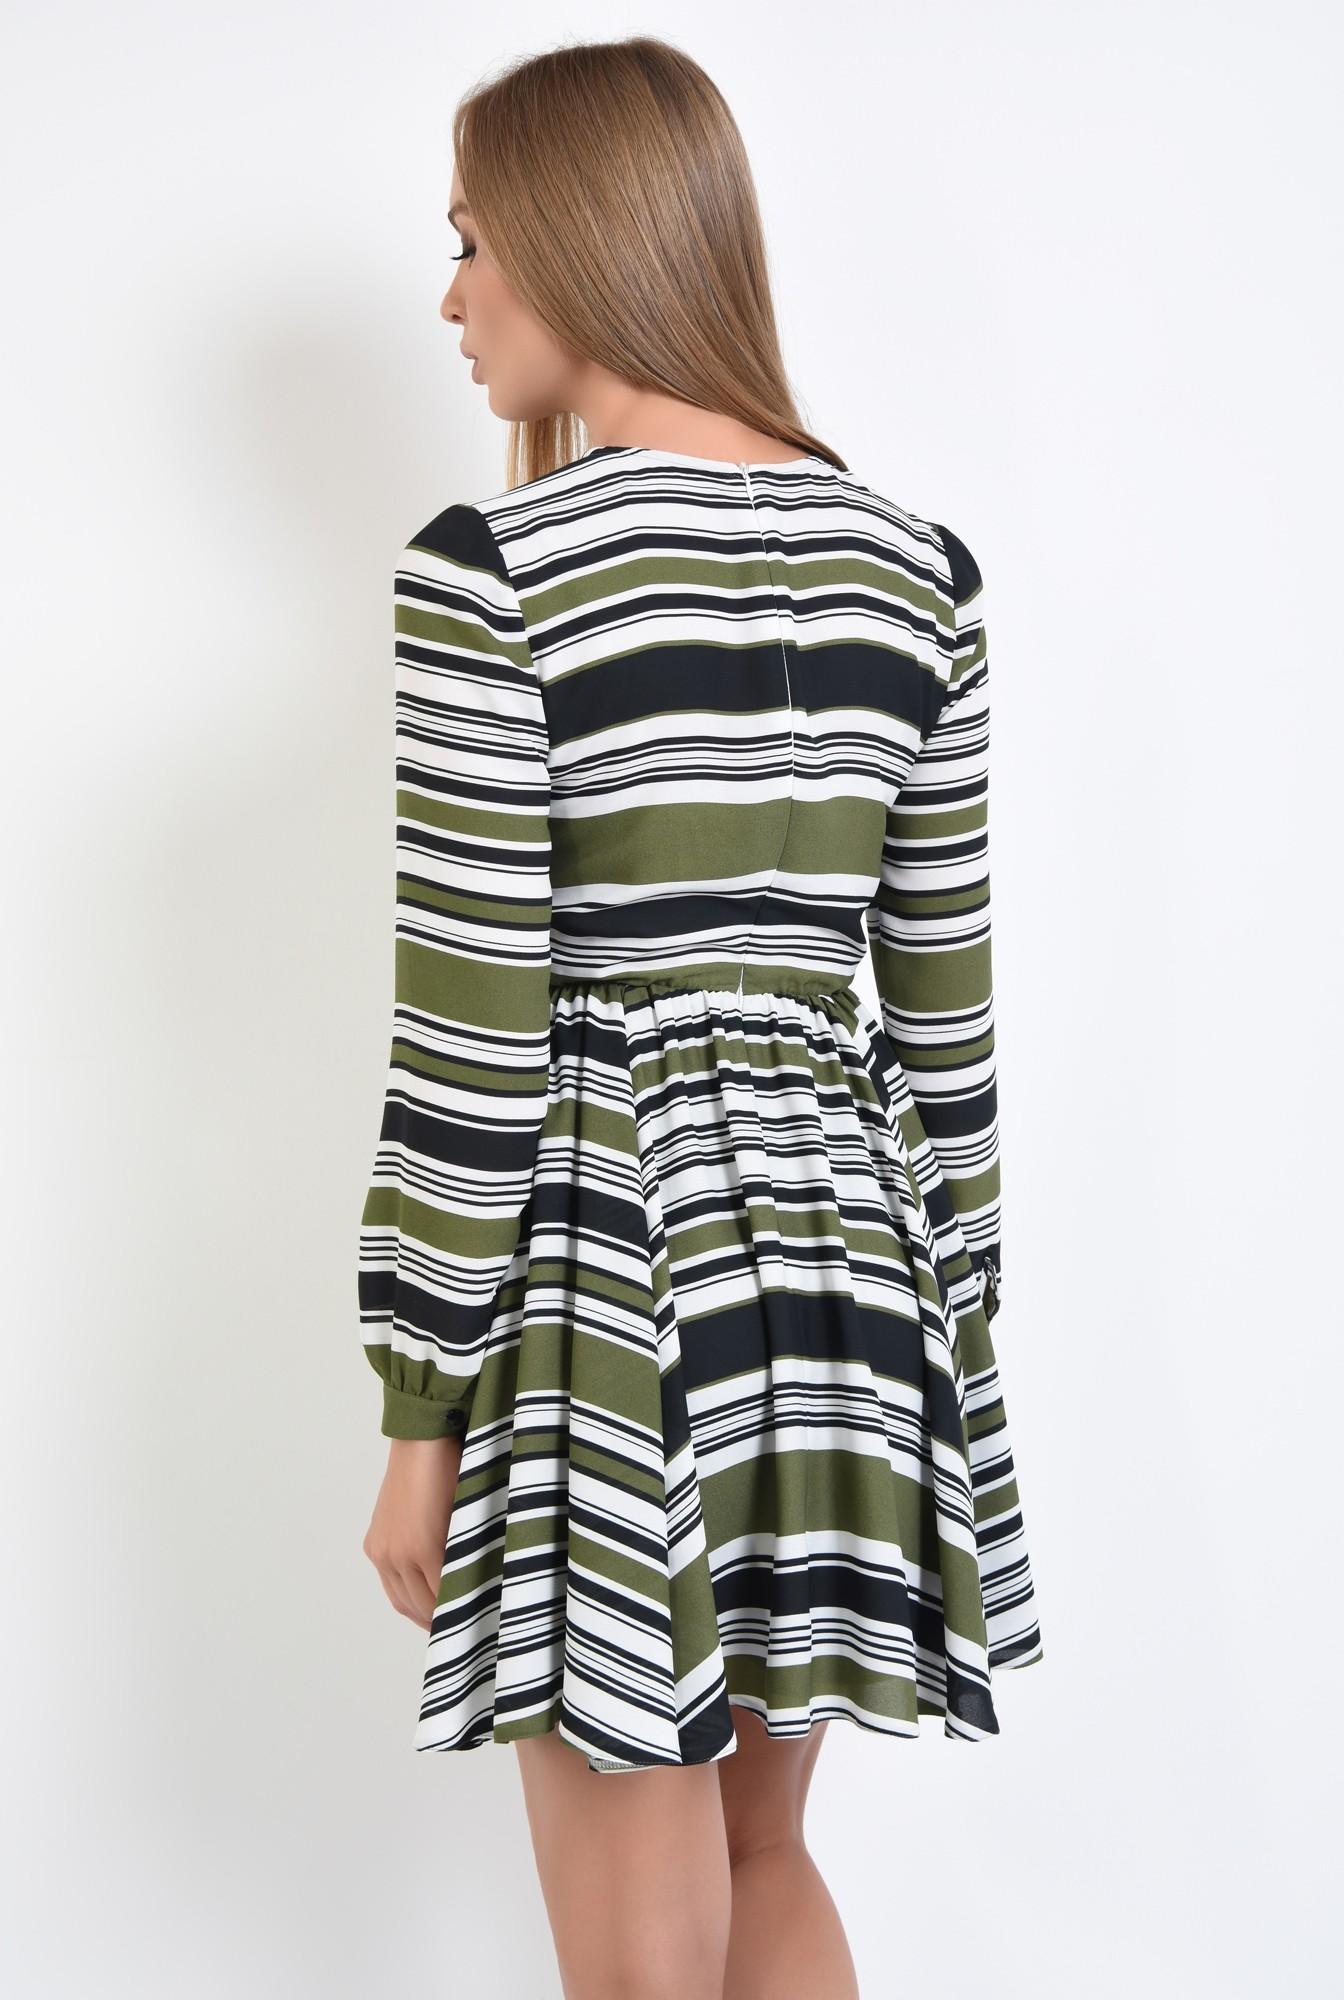 1 - rochie casual, talie pe elastic, decolteu rotund la baza gatului, rochii online